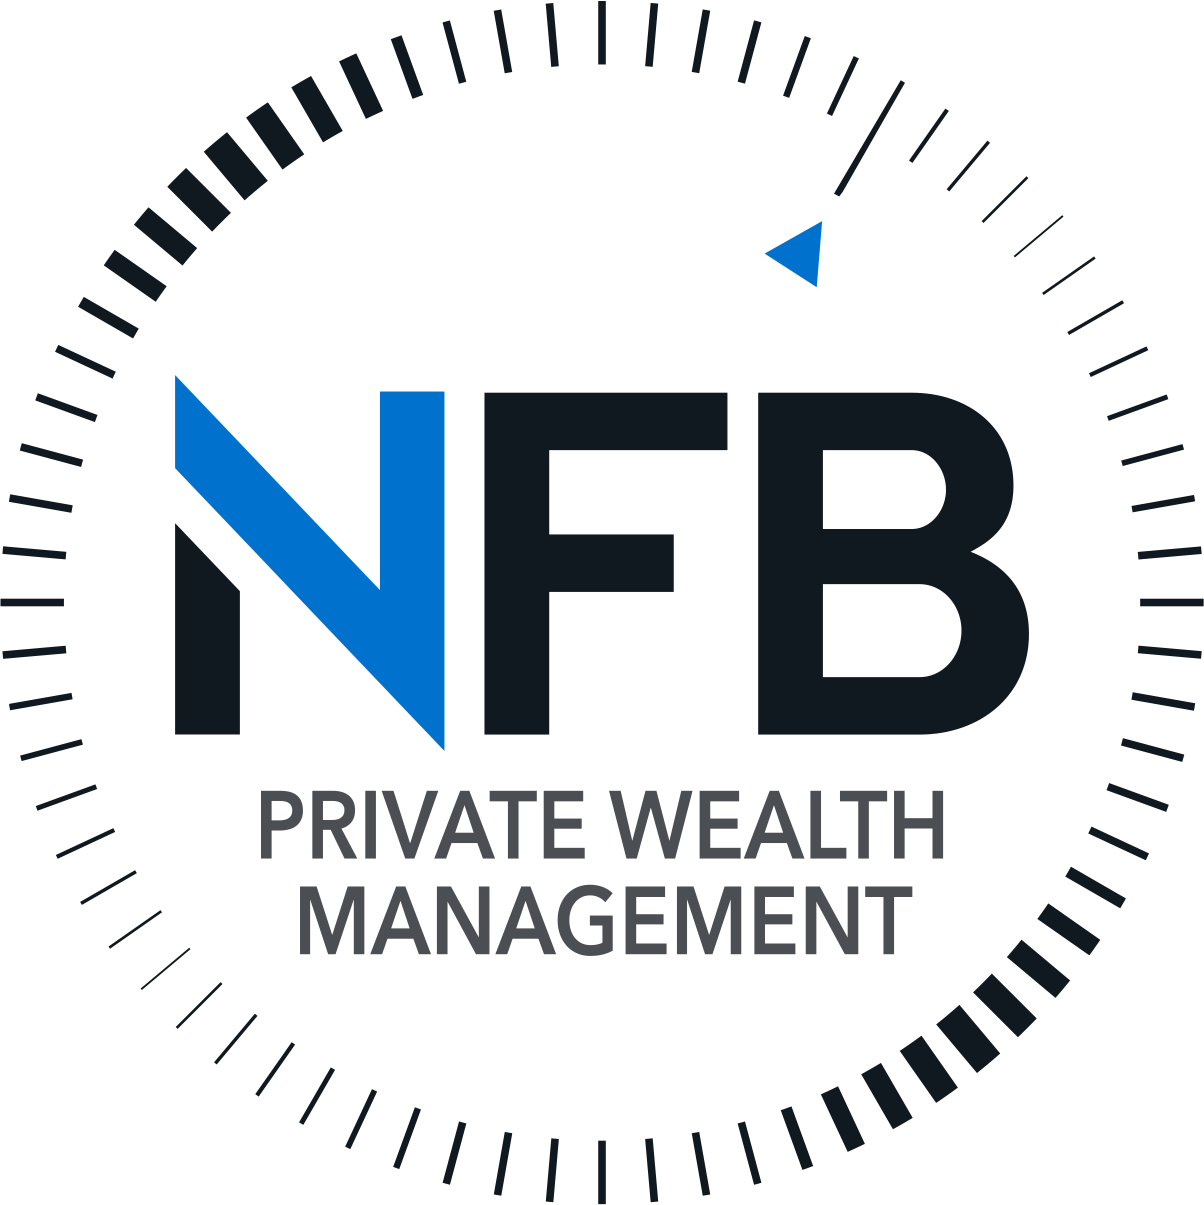 Co-authored by Jonathan Braans and Stephen Katzenellenbogen CFP®